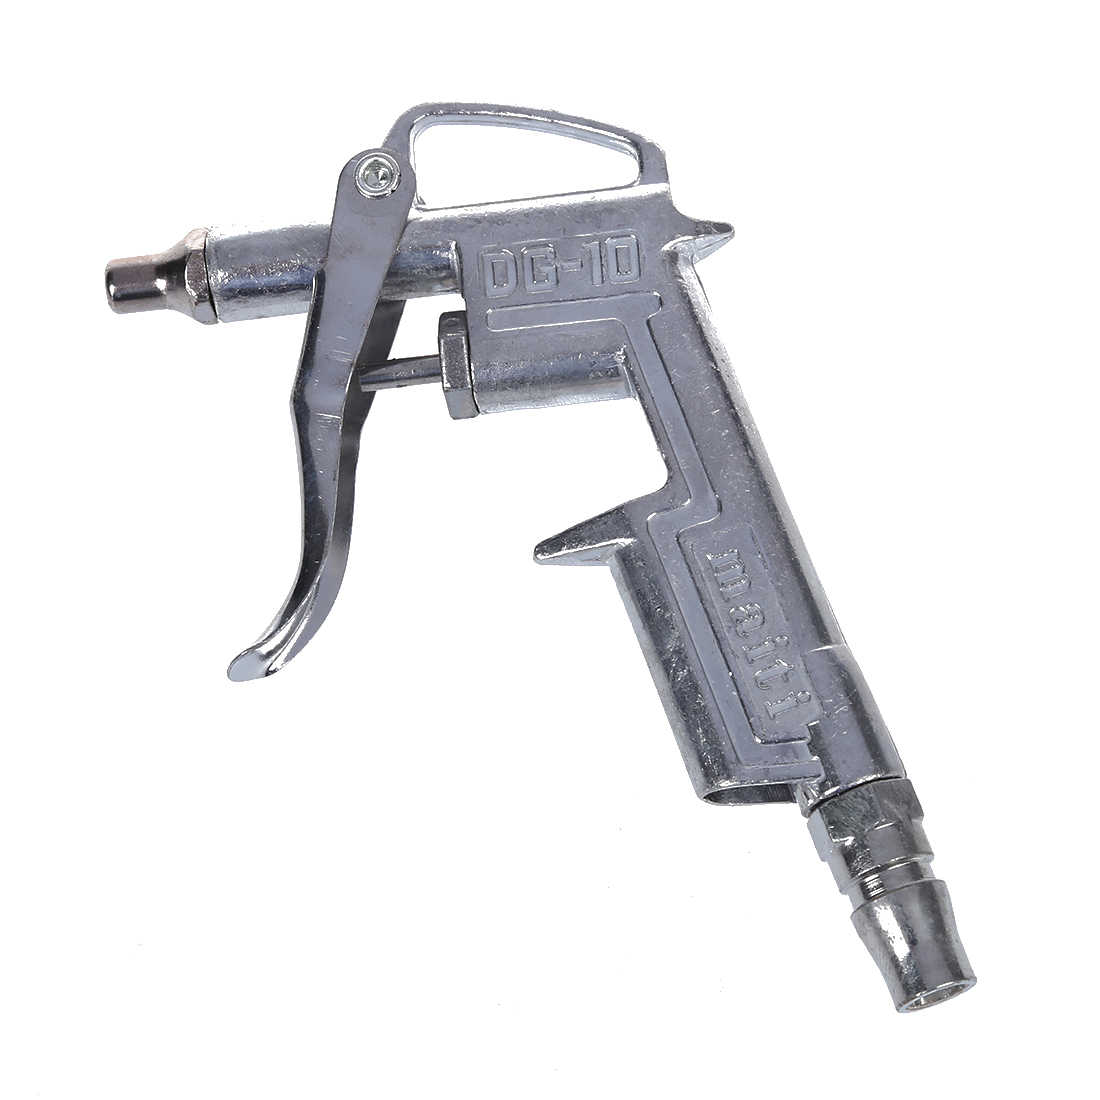 Dust Verwijderen Air Blow Gun Cleaning Tool Silver Tone